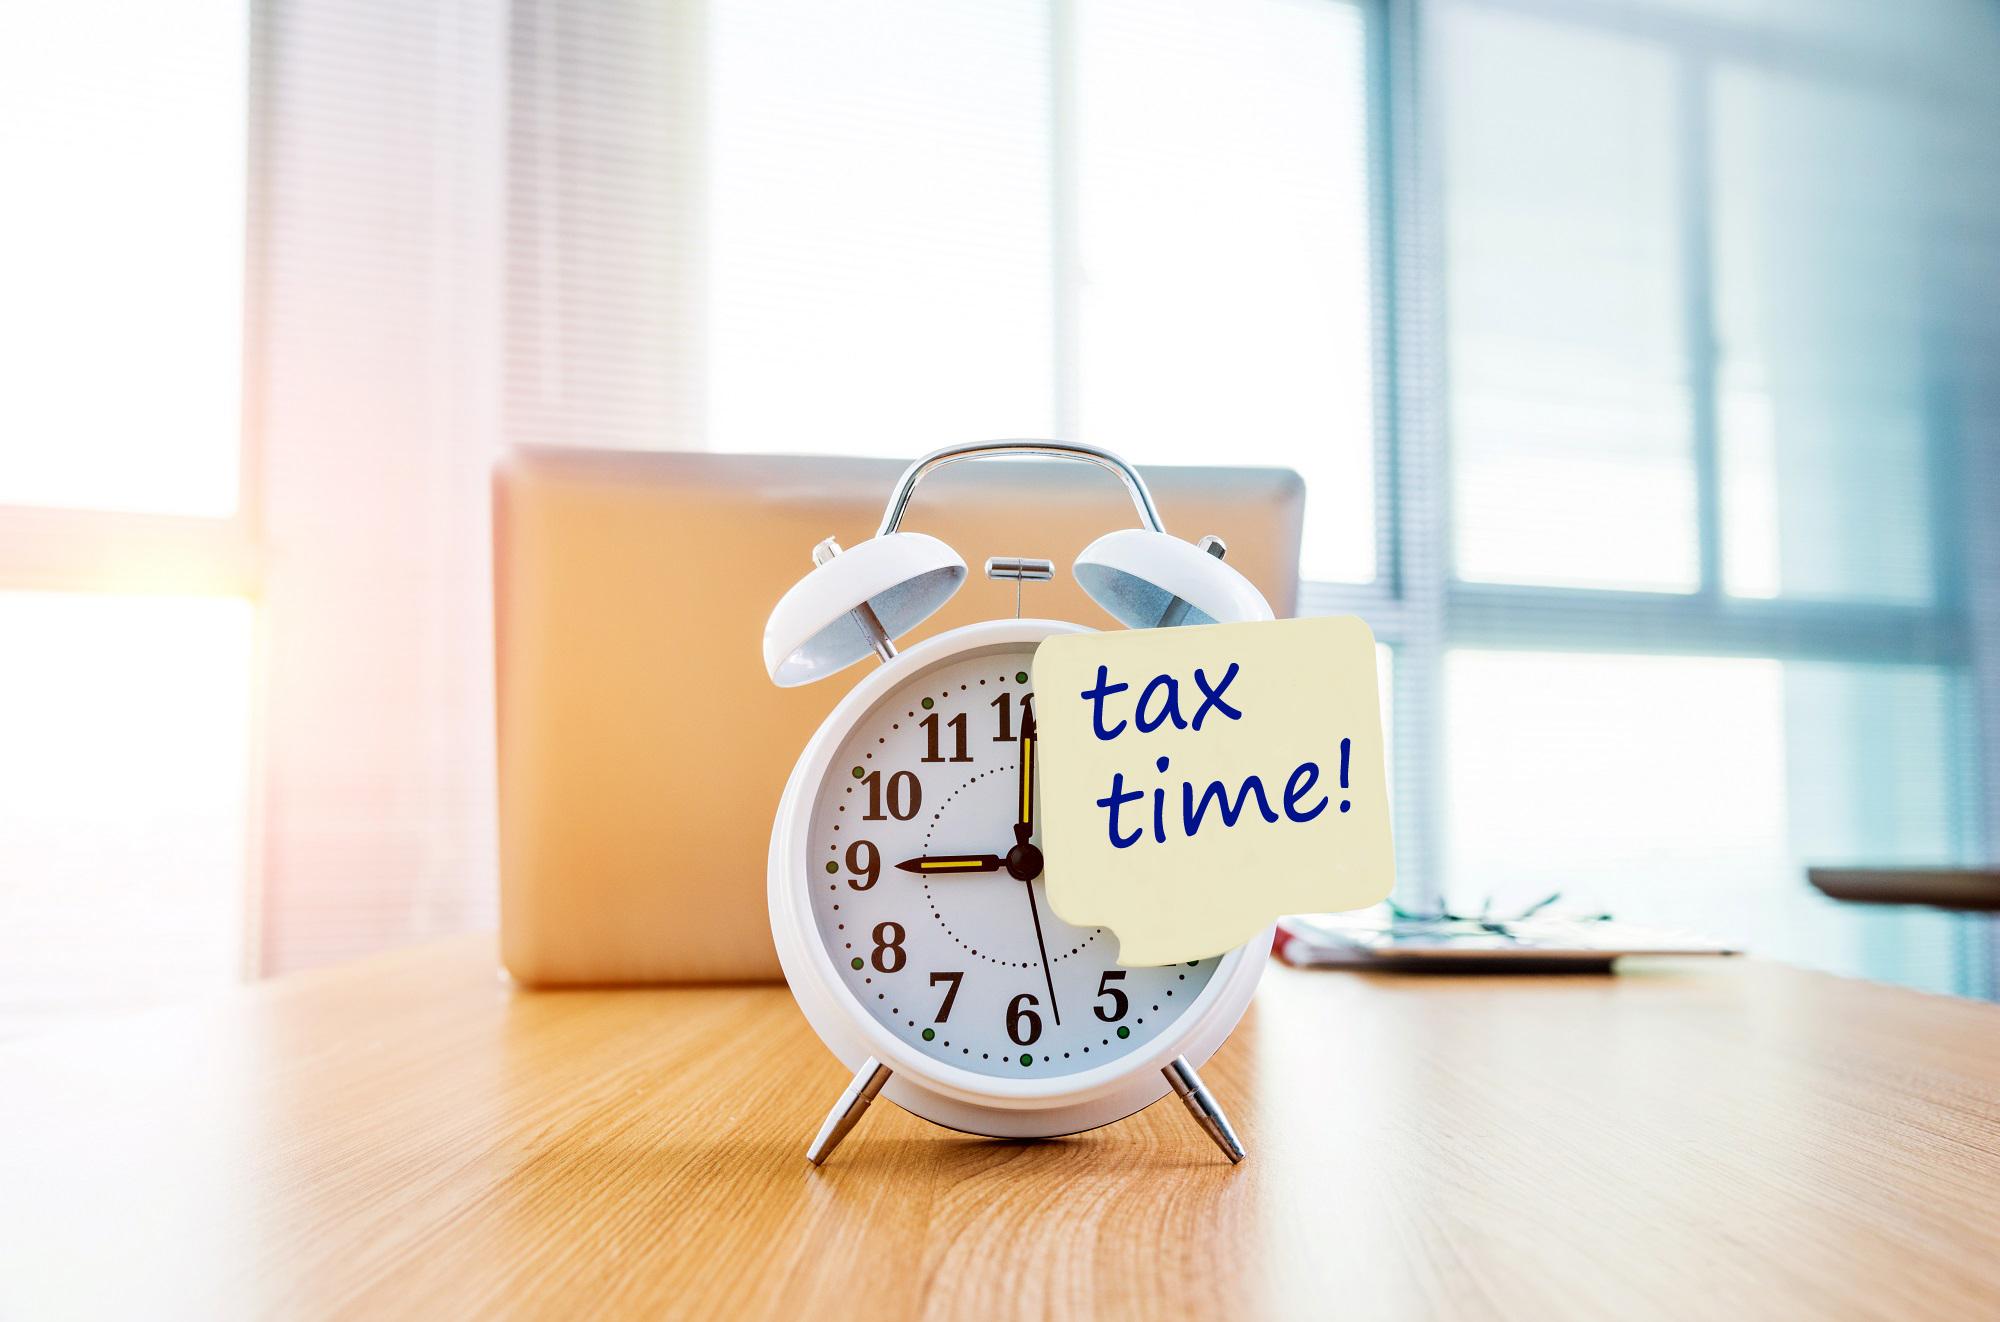 Get your 2019 tax receipt